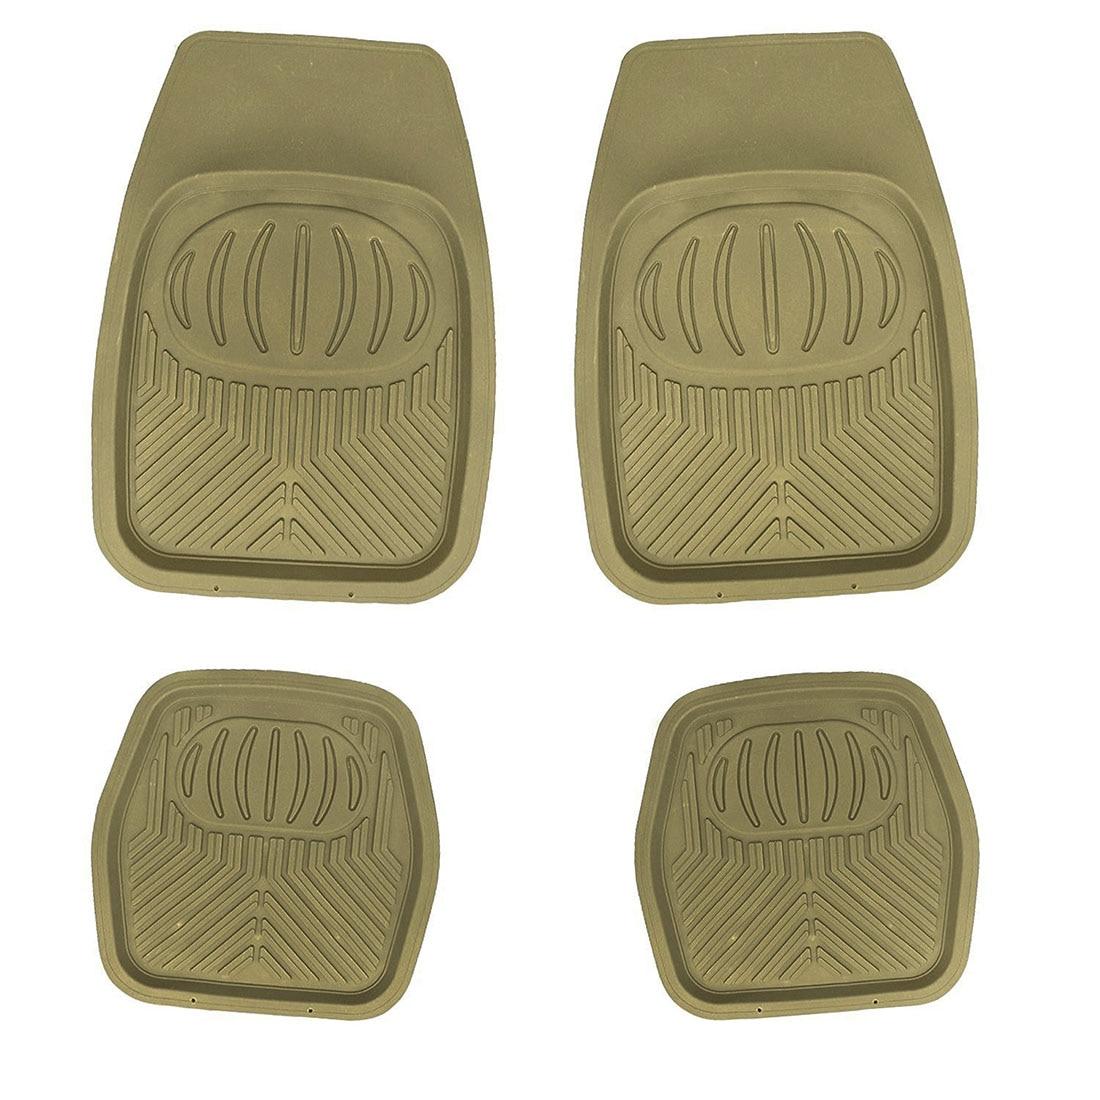 Infiniti qx60 rubber floor mats - Multi Season Rubber Floor Mats 4pc Set Beige Fit Most Cars Suvs Vans And